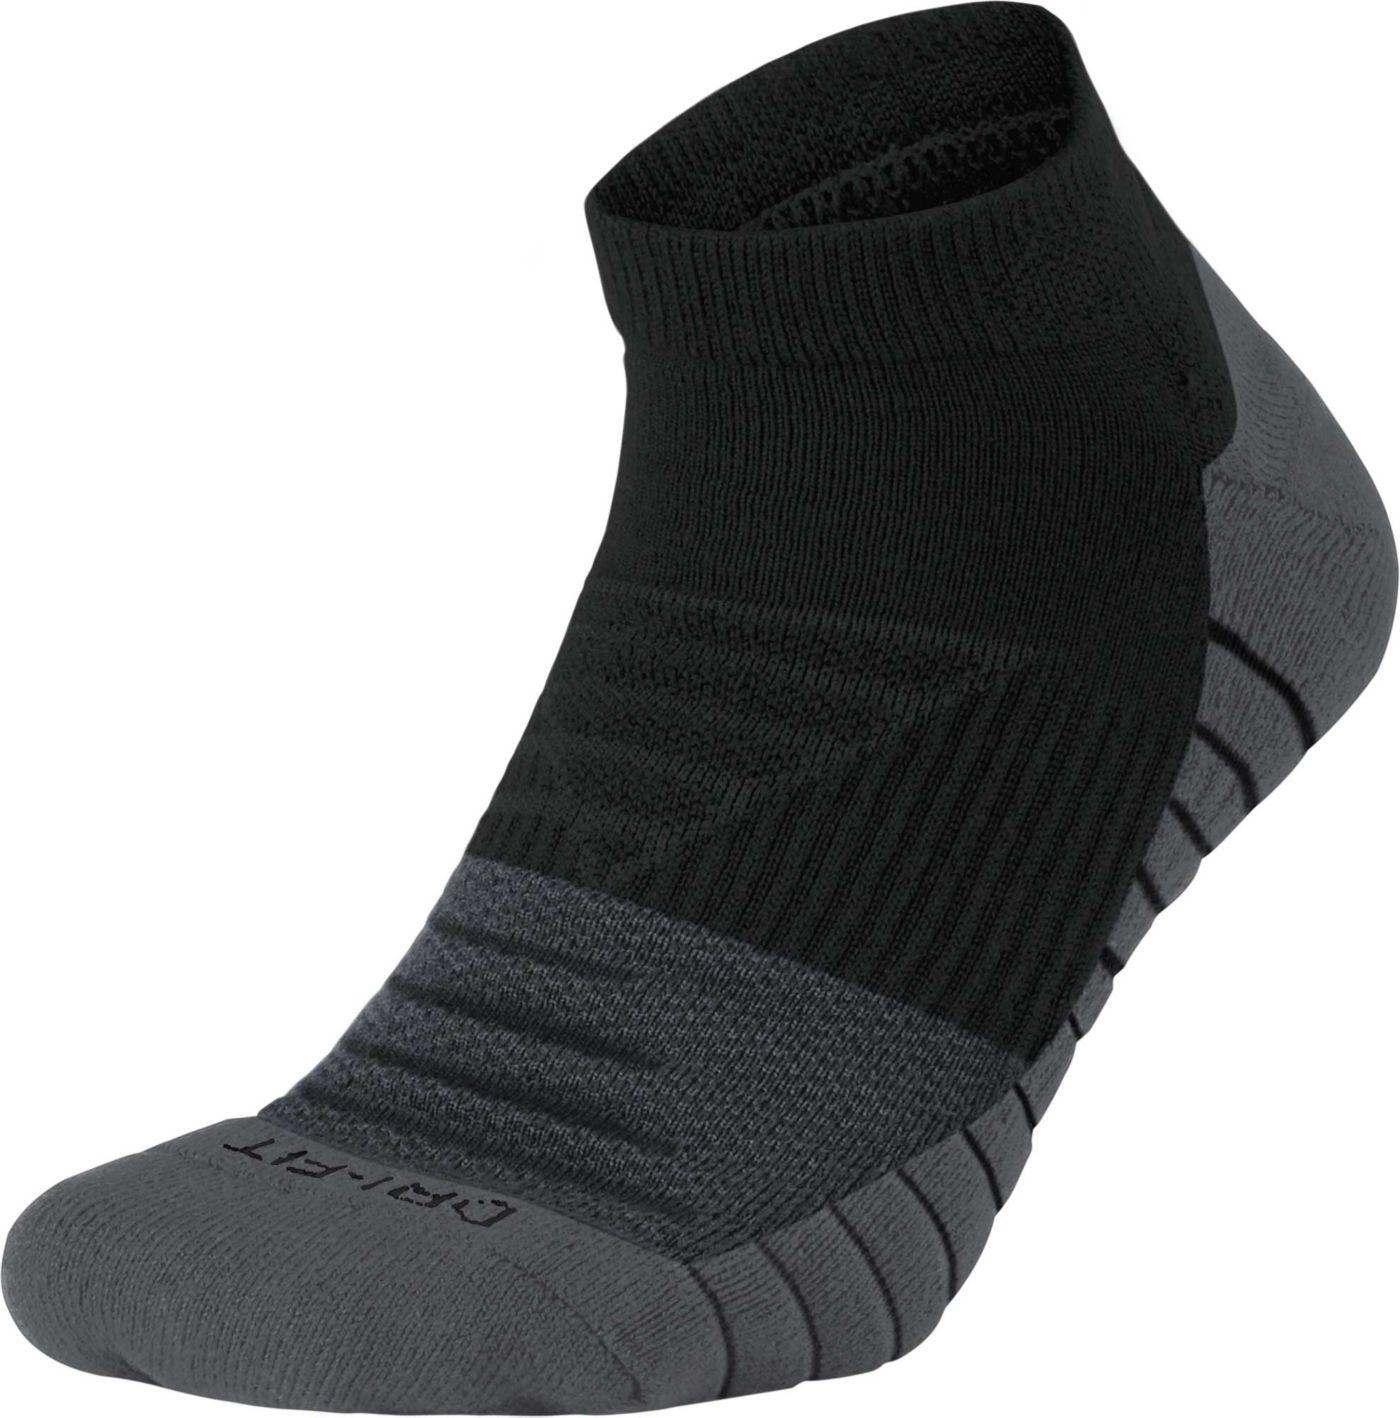 Nike Men's Dri-FIT Cushioned No-Show Golf Socks